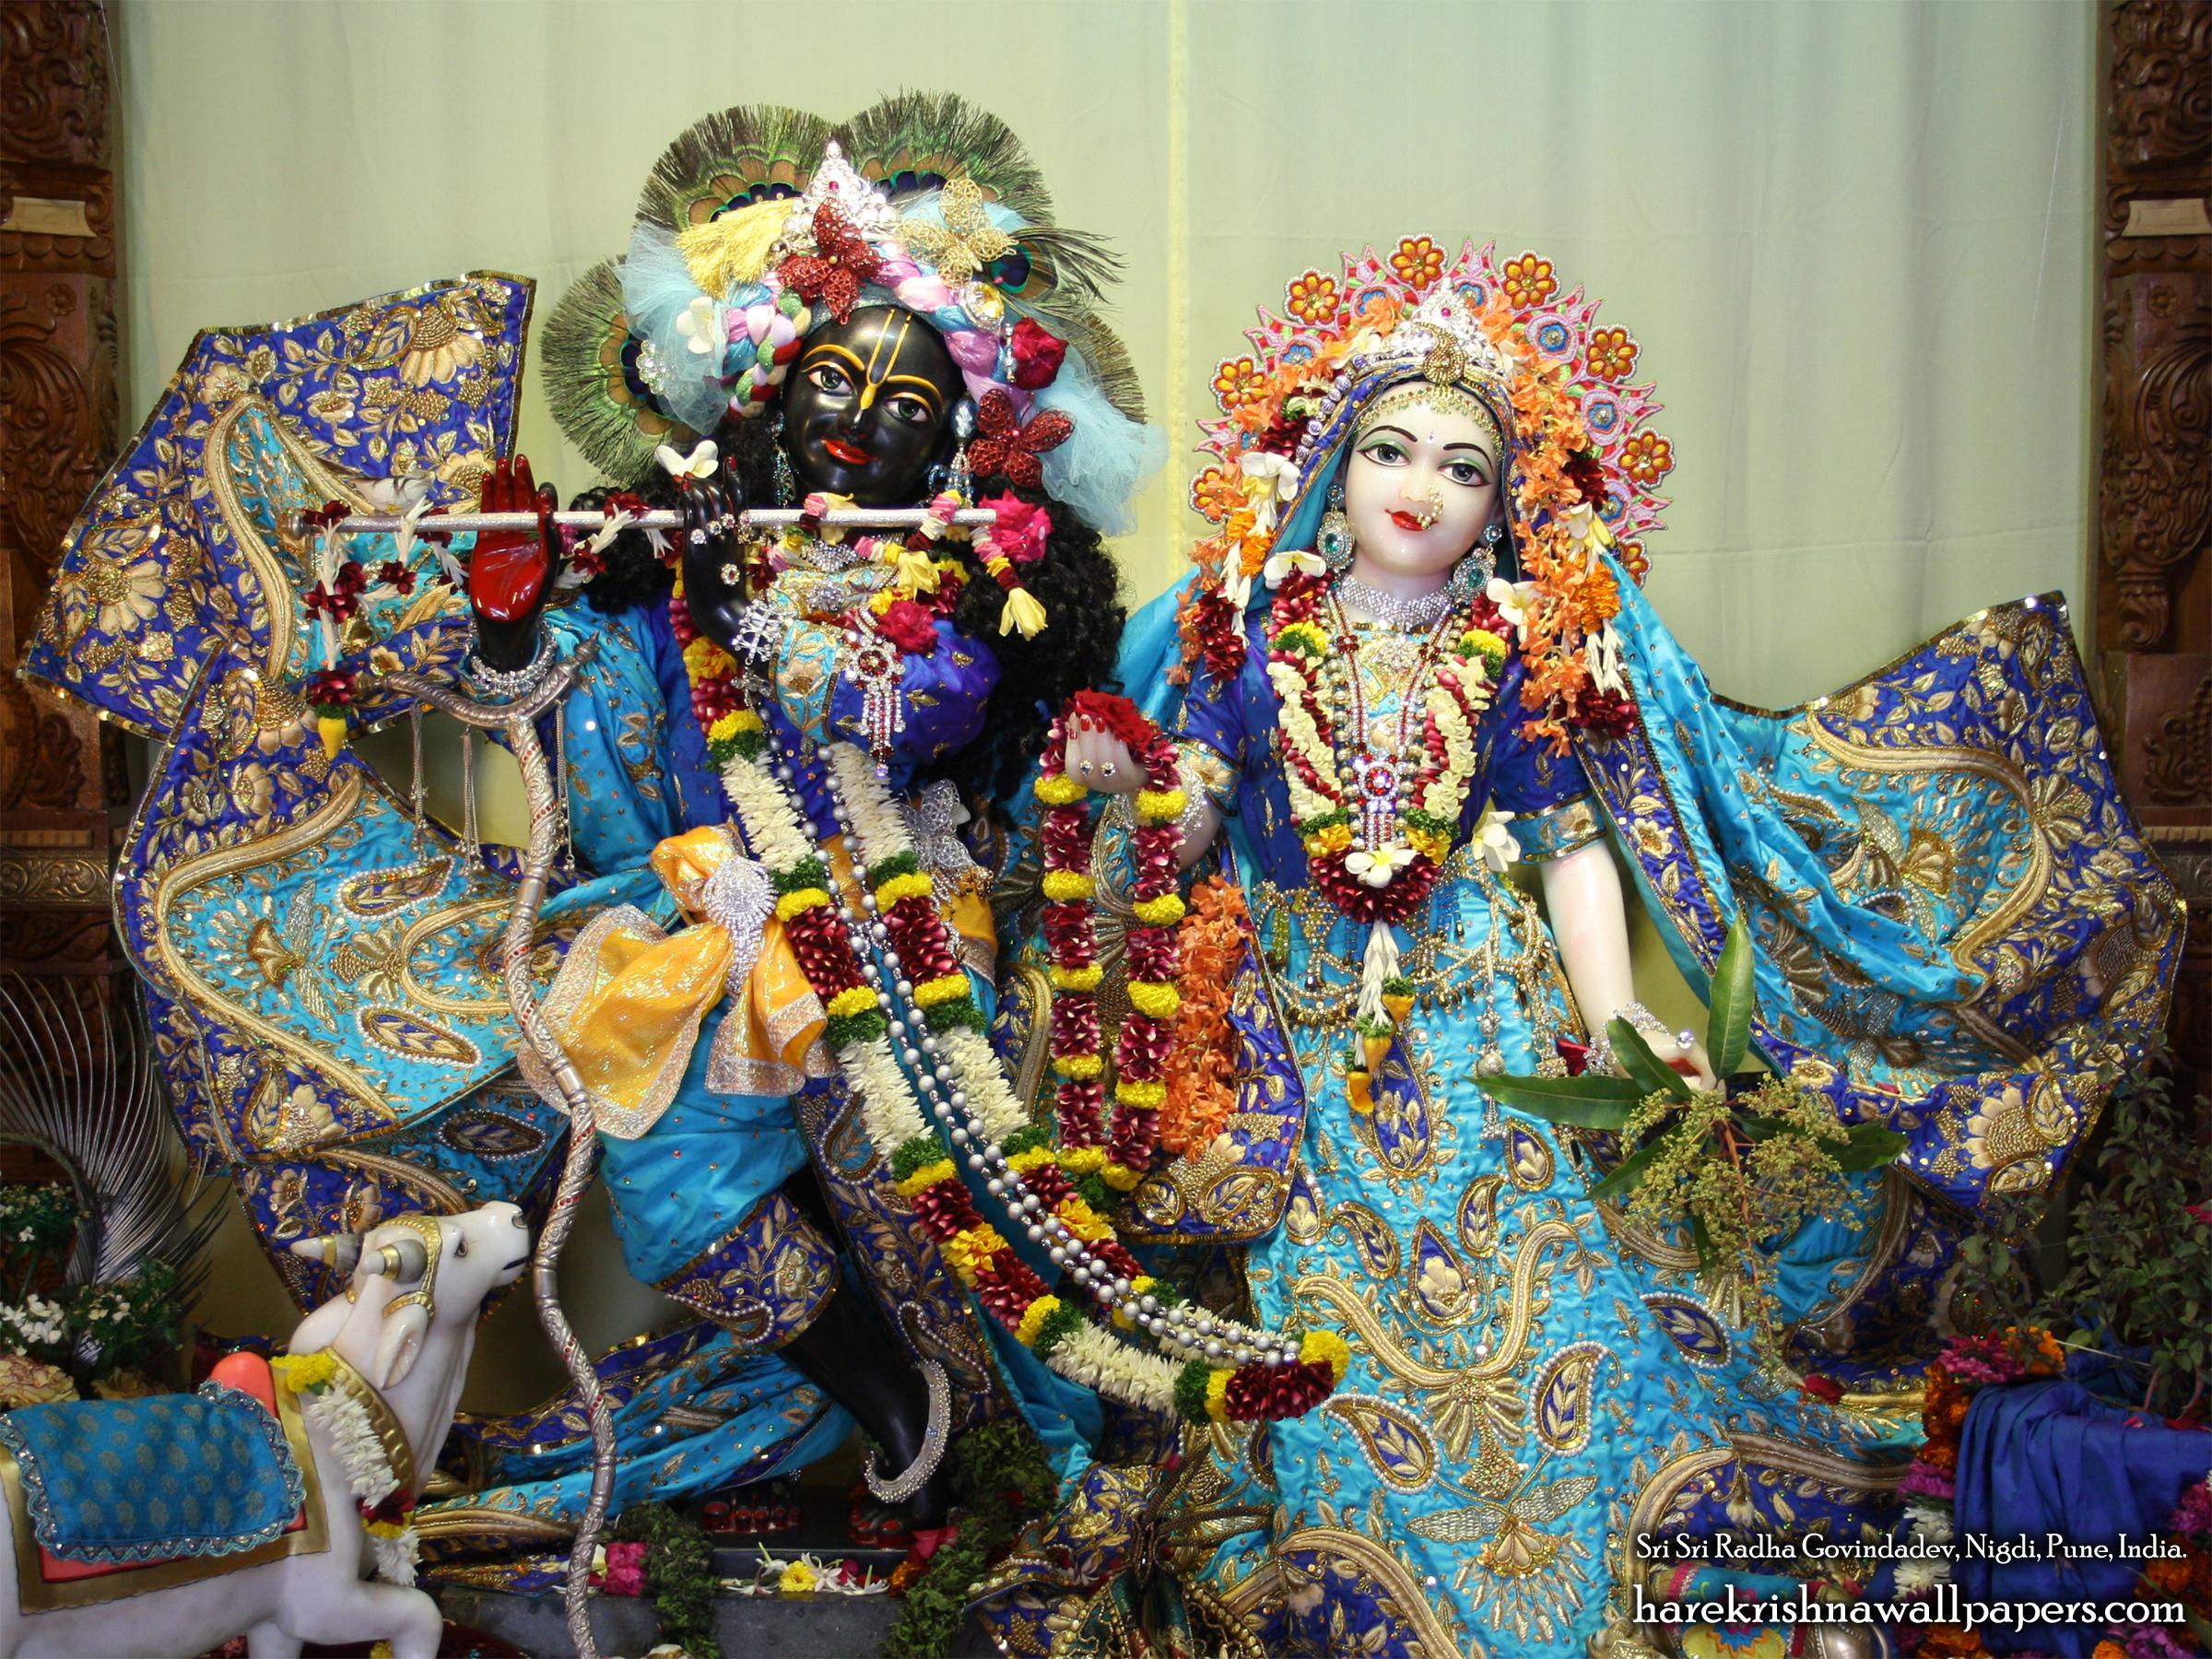 Sri Sri Radha Govind Wallpaper (035) Size 2400x1800 Download